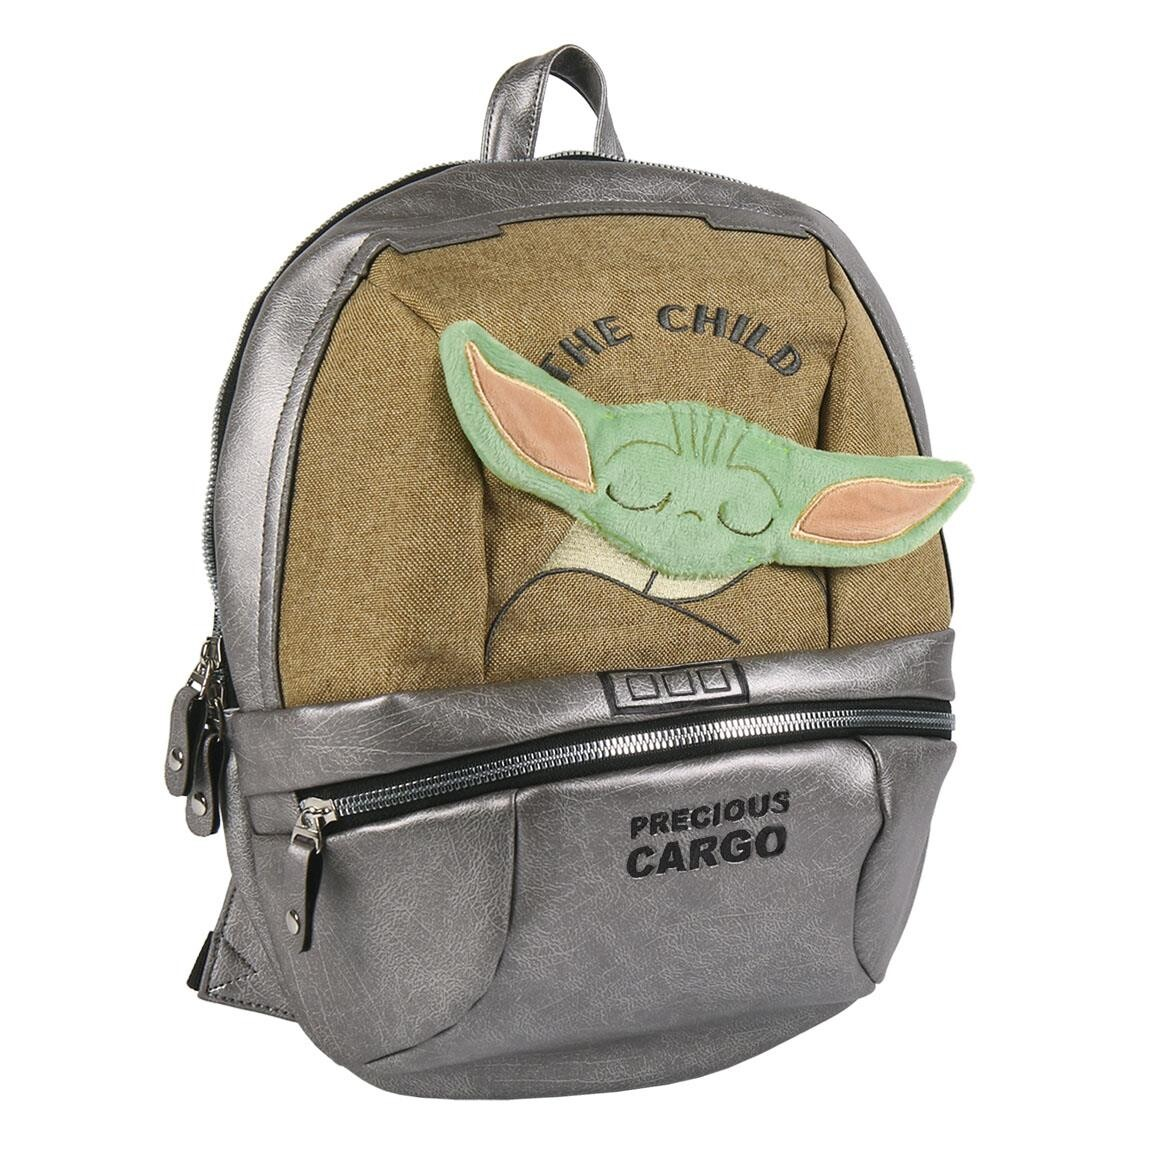 Ryggsekk Star Wars: The Mandalorian The Child (Baby Yoda